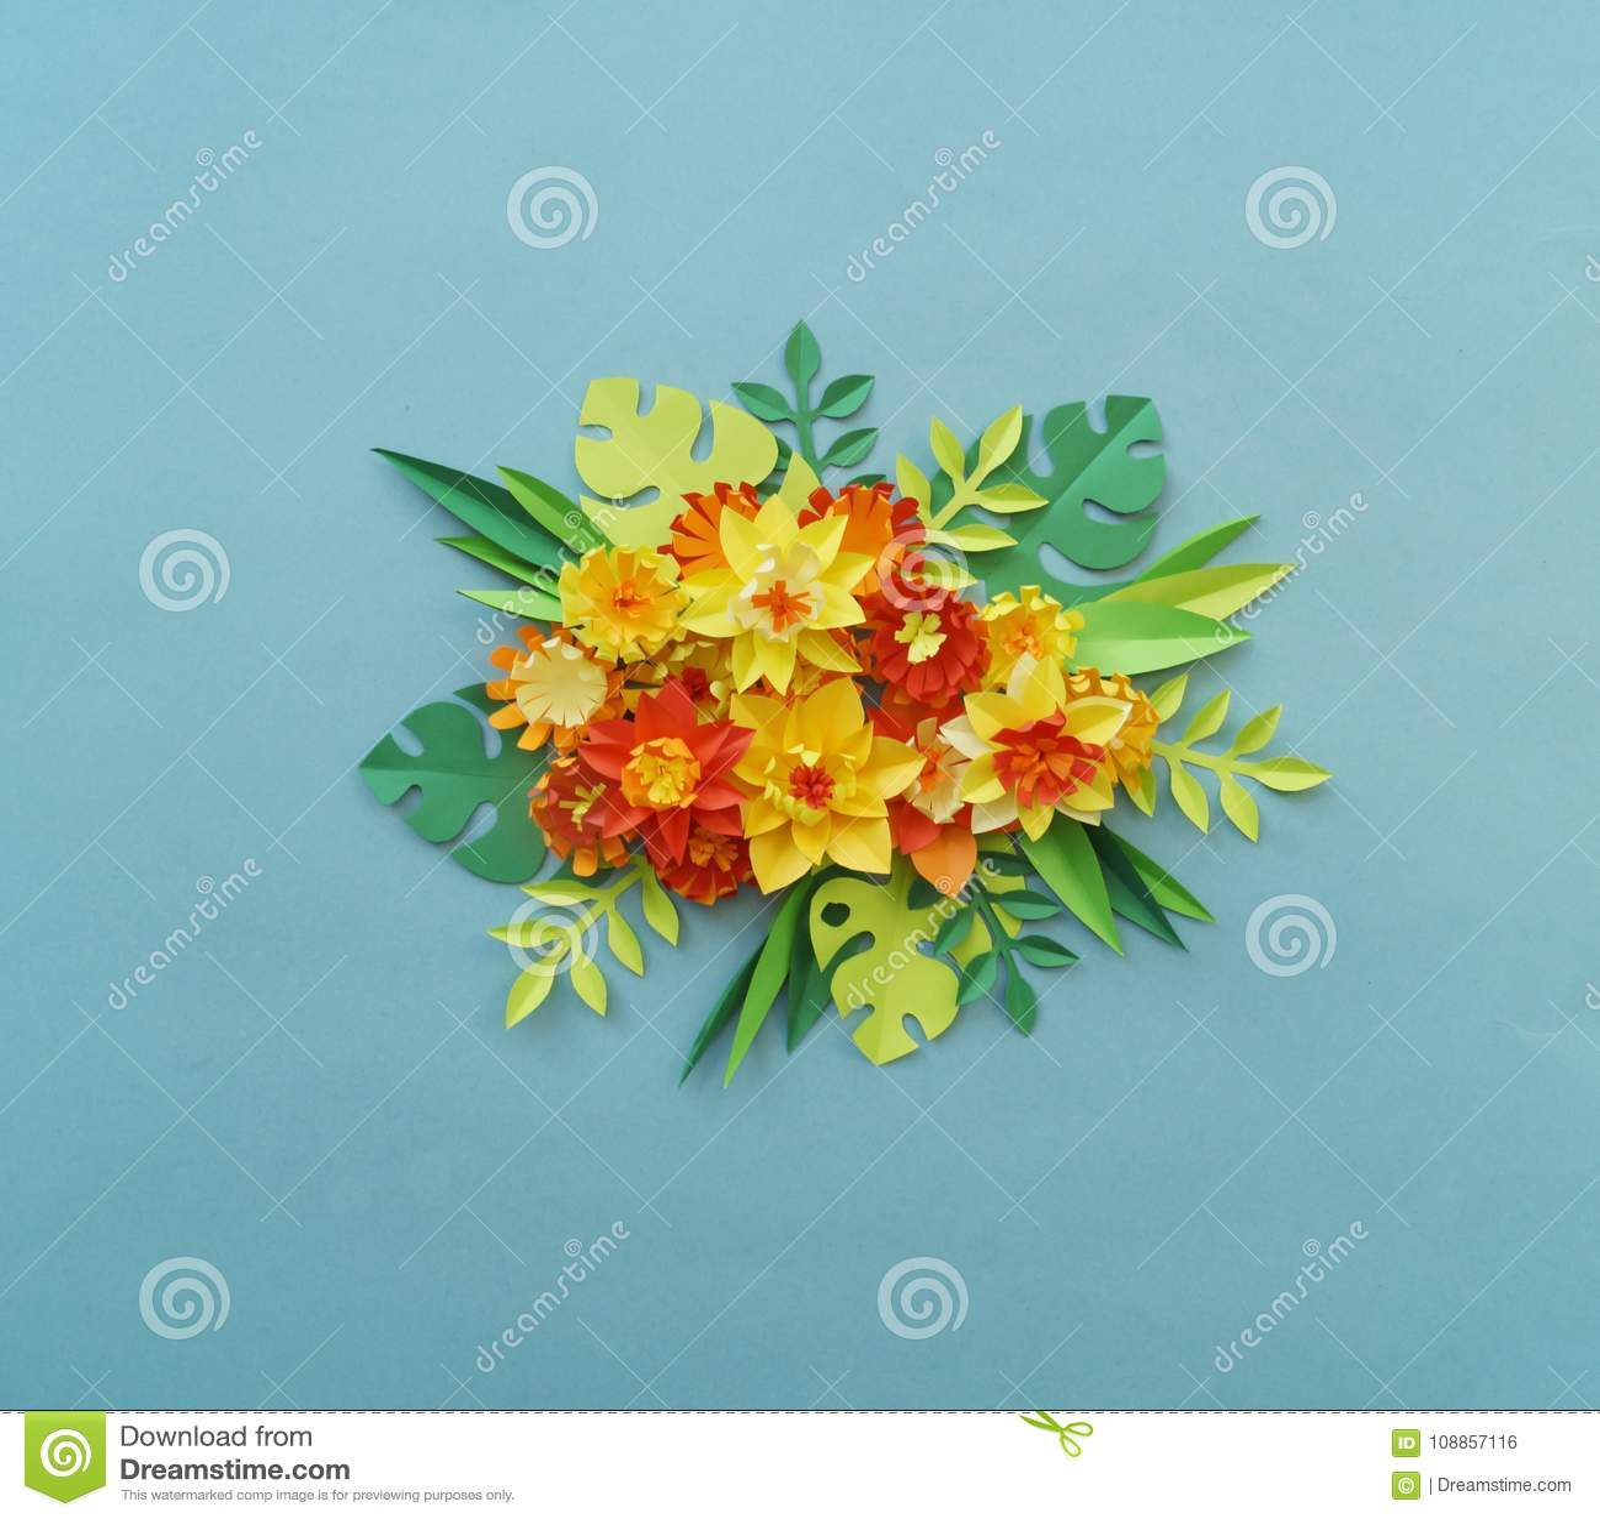 Floral arrangement of paper flowers on a blue background tropical floral arrangement of paper flowers on a blue background tropical flowers and leaves redyellowgreenorange and blue handmade flower mightylinksfo